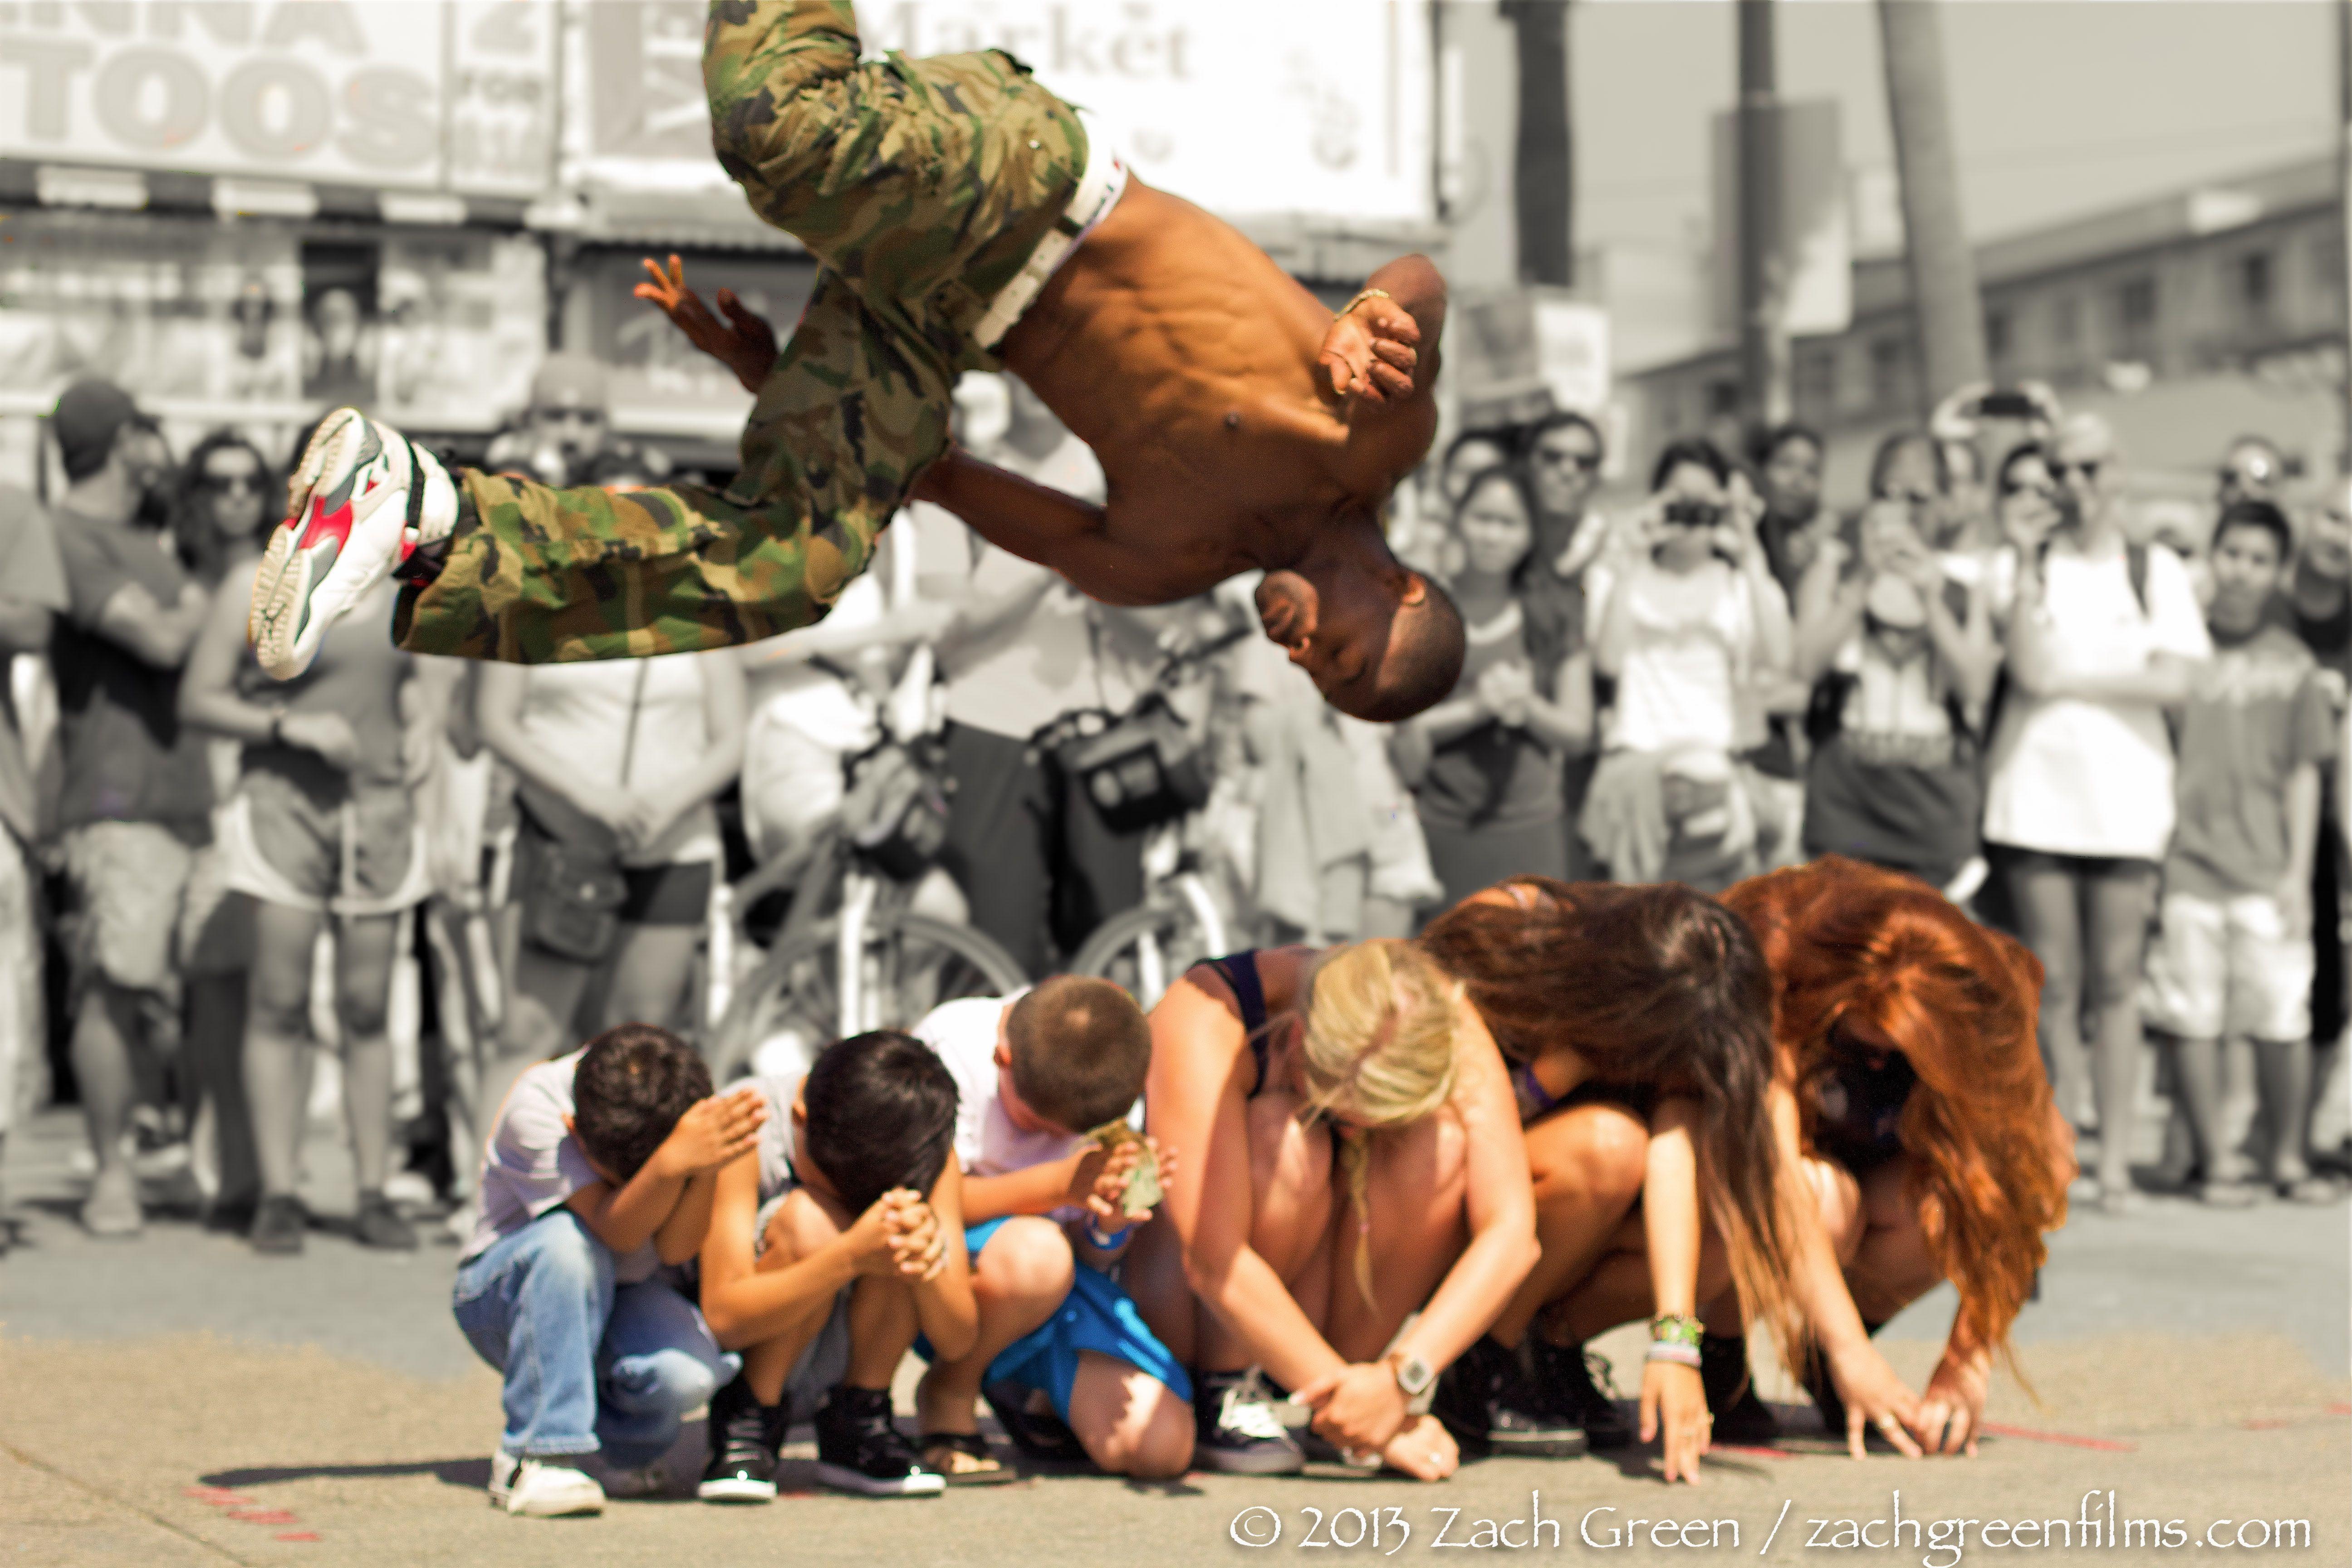 Venice Beach Street Performers Zach Green Films Mood Boards